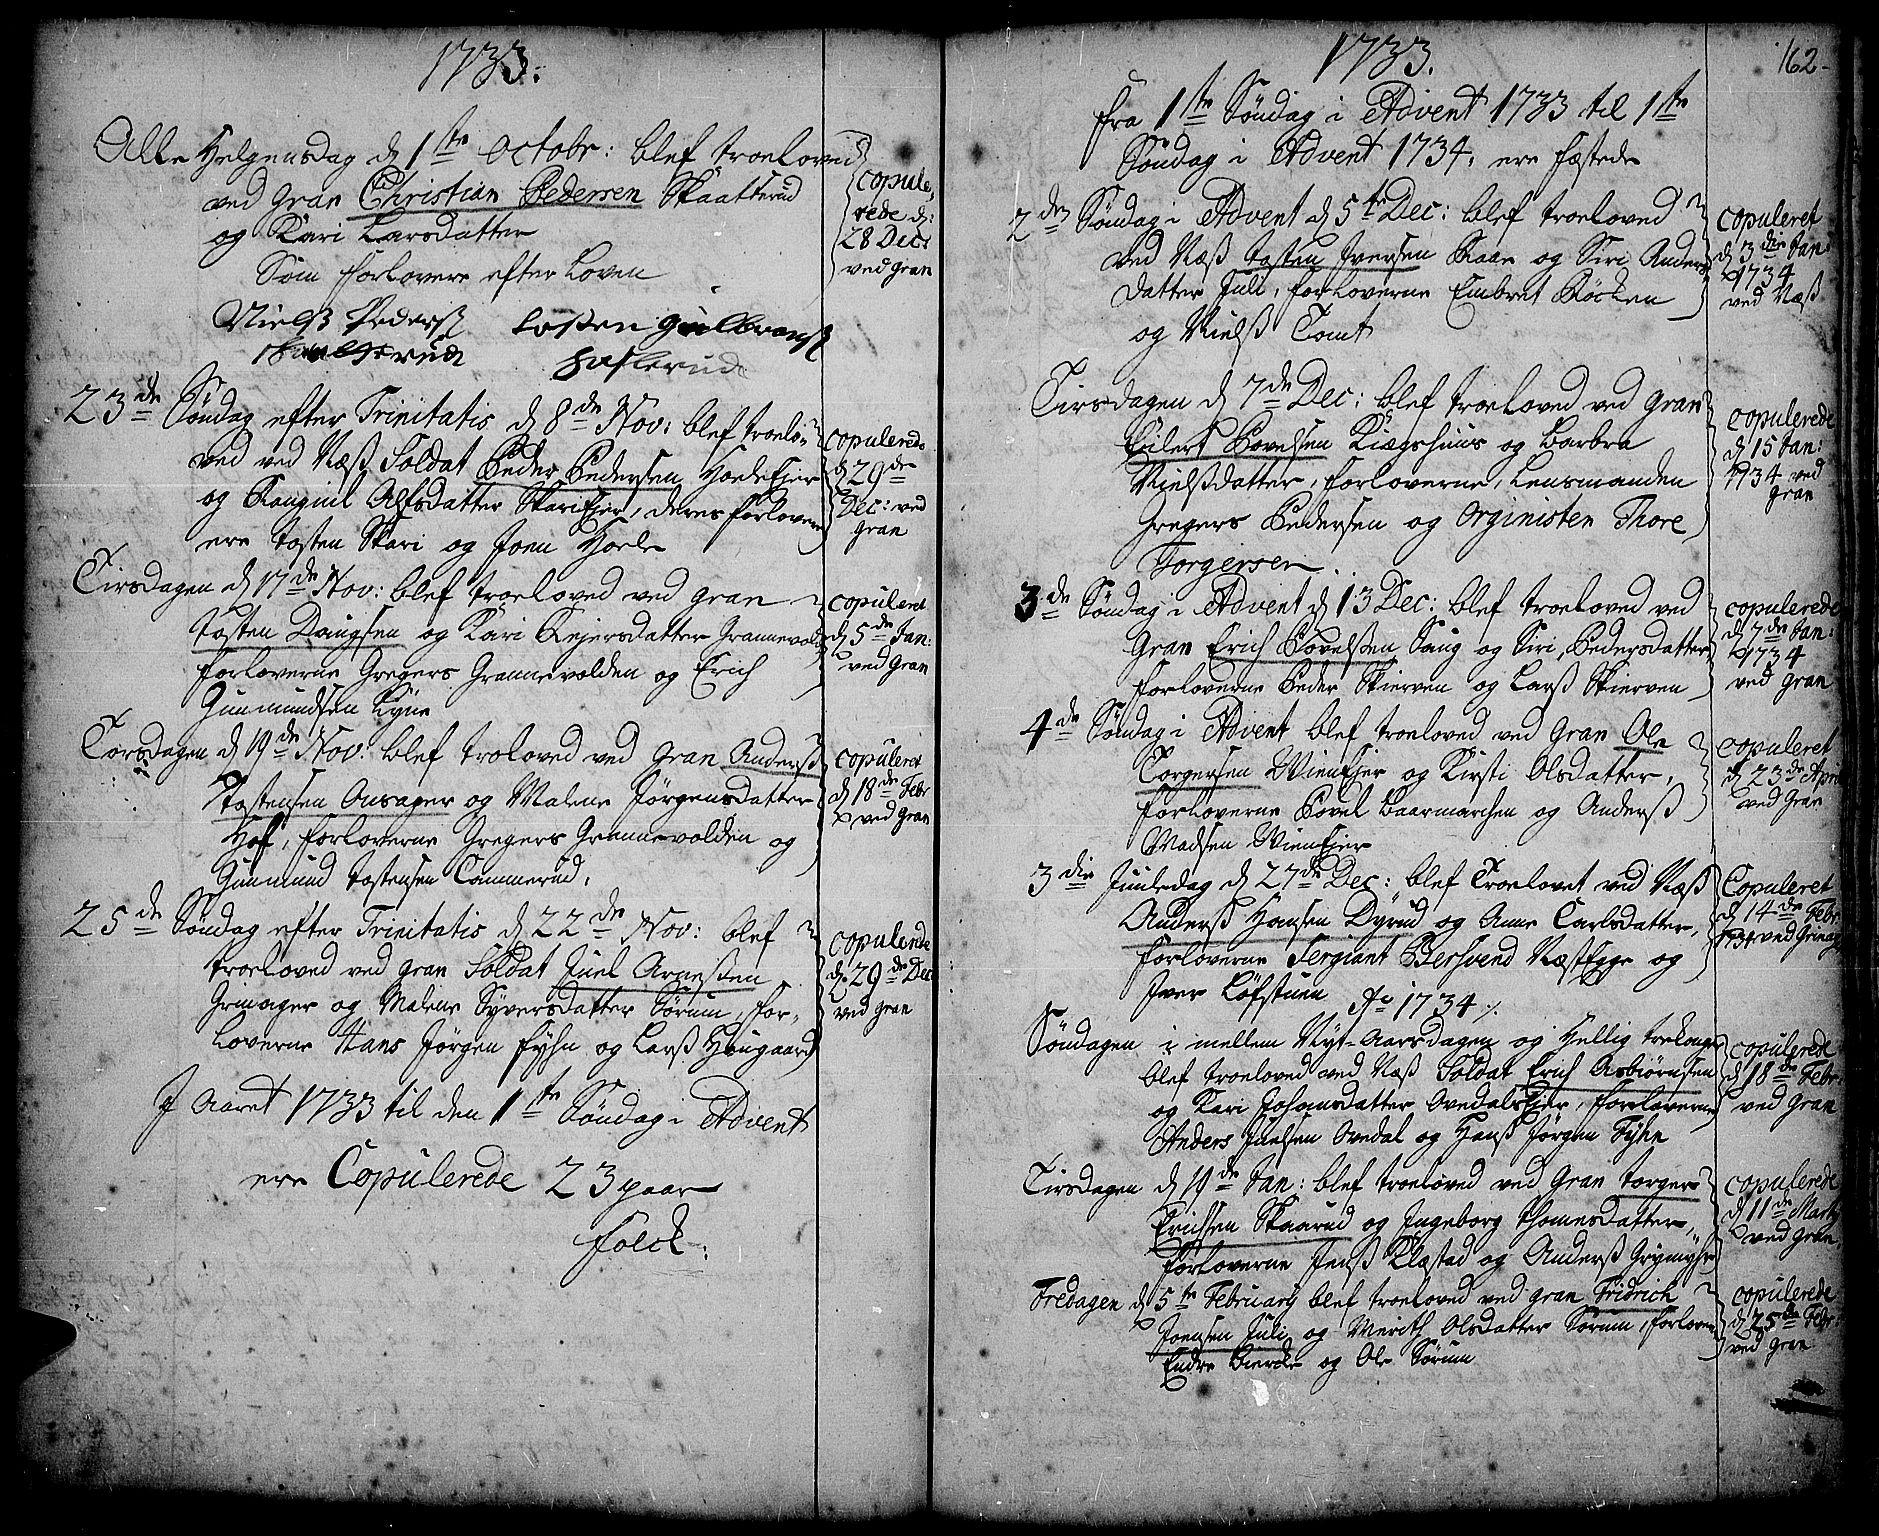 SAH, Gran prestekontor, Ministerialbok nr. 2, 1732-1744, s. 162